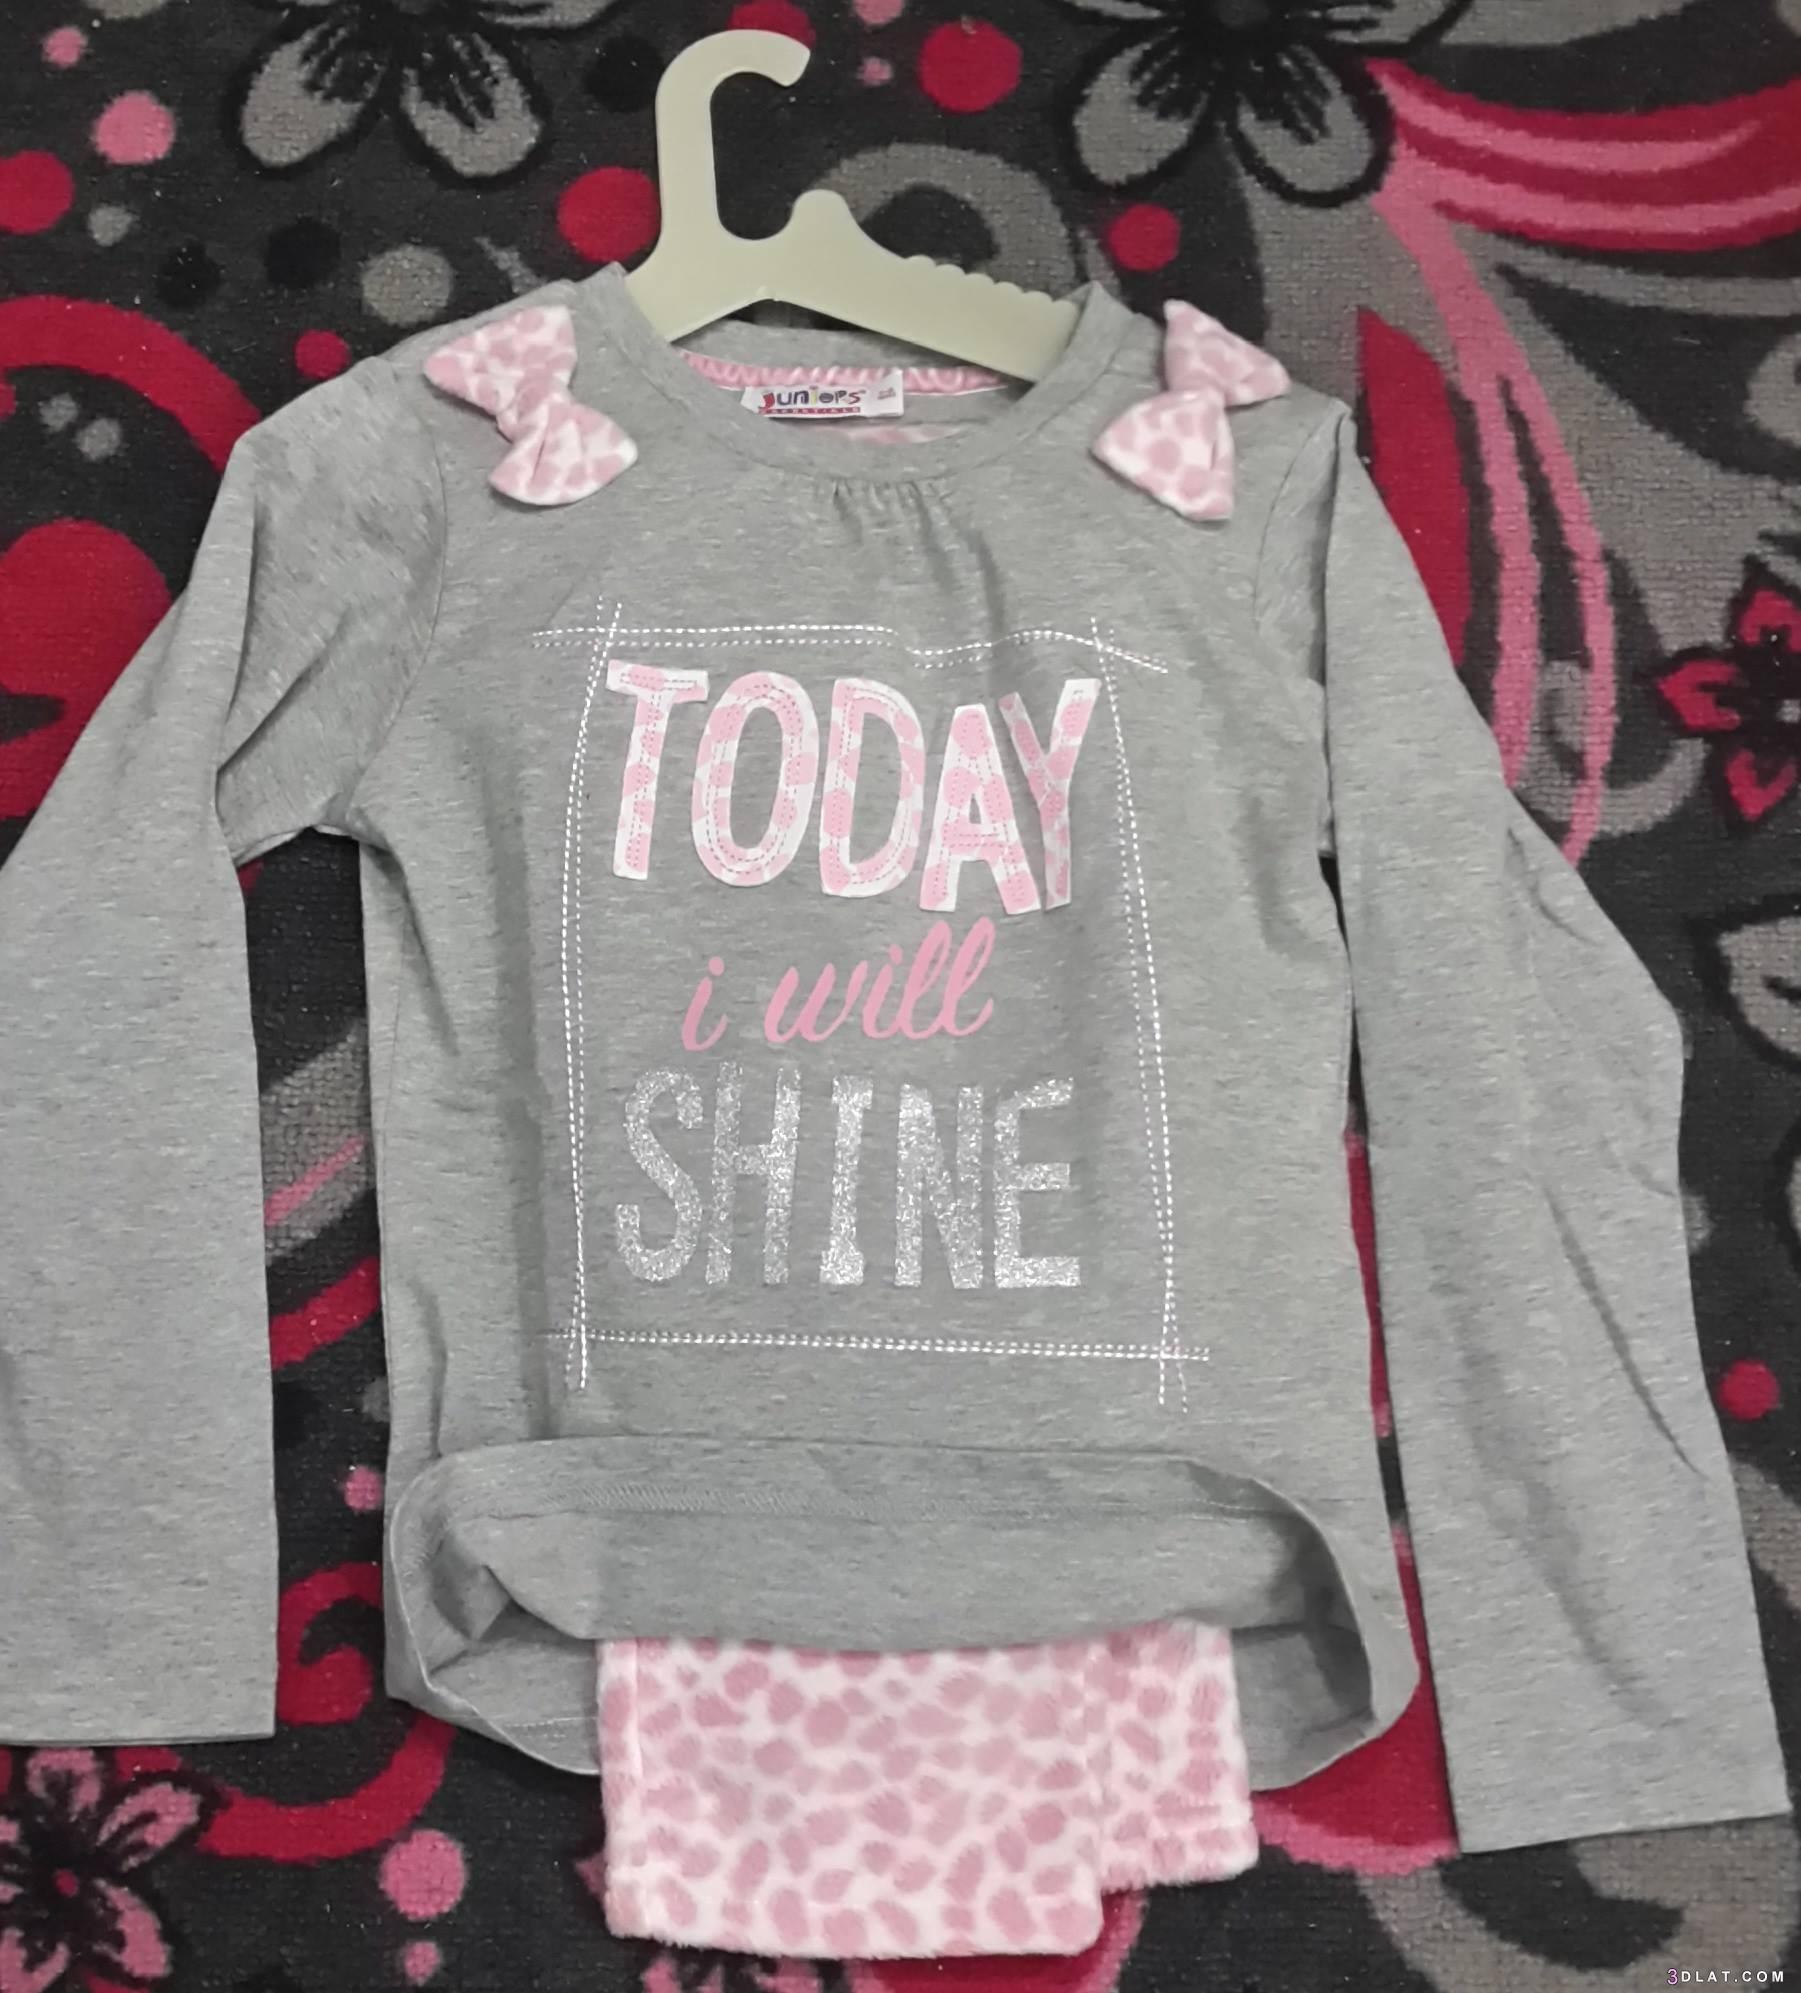 ملابس اْطفال 2019 3dlat.com_10_18_f18a